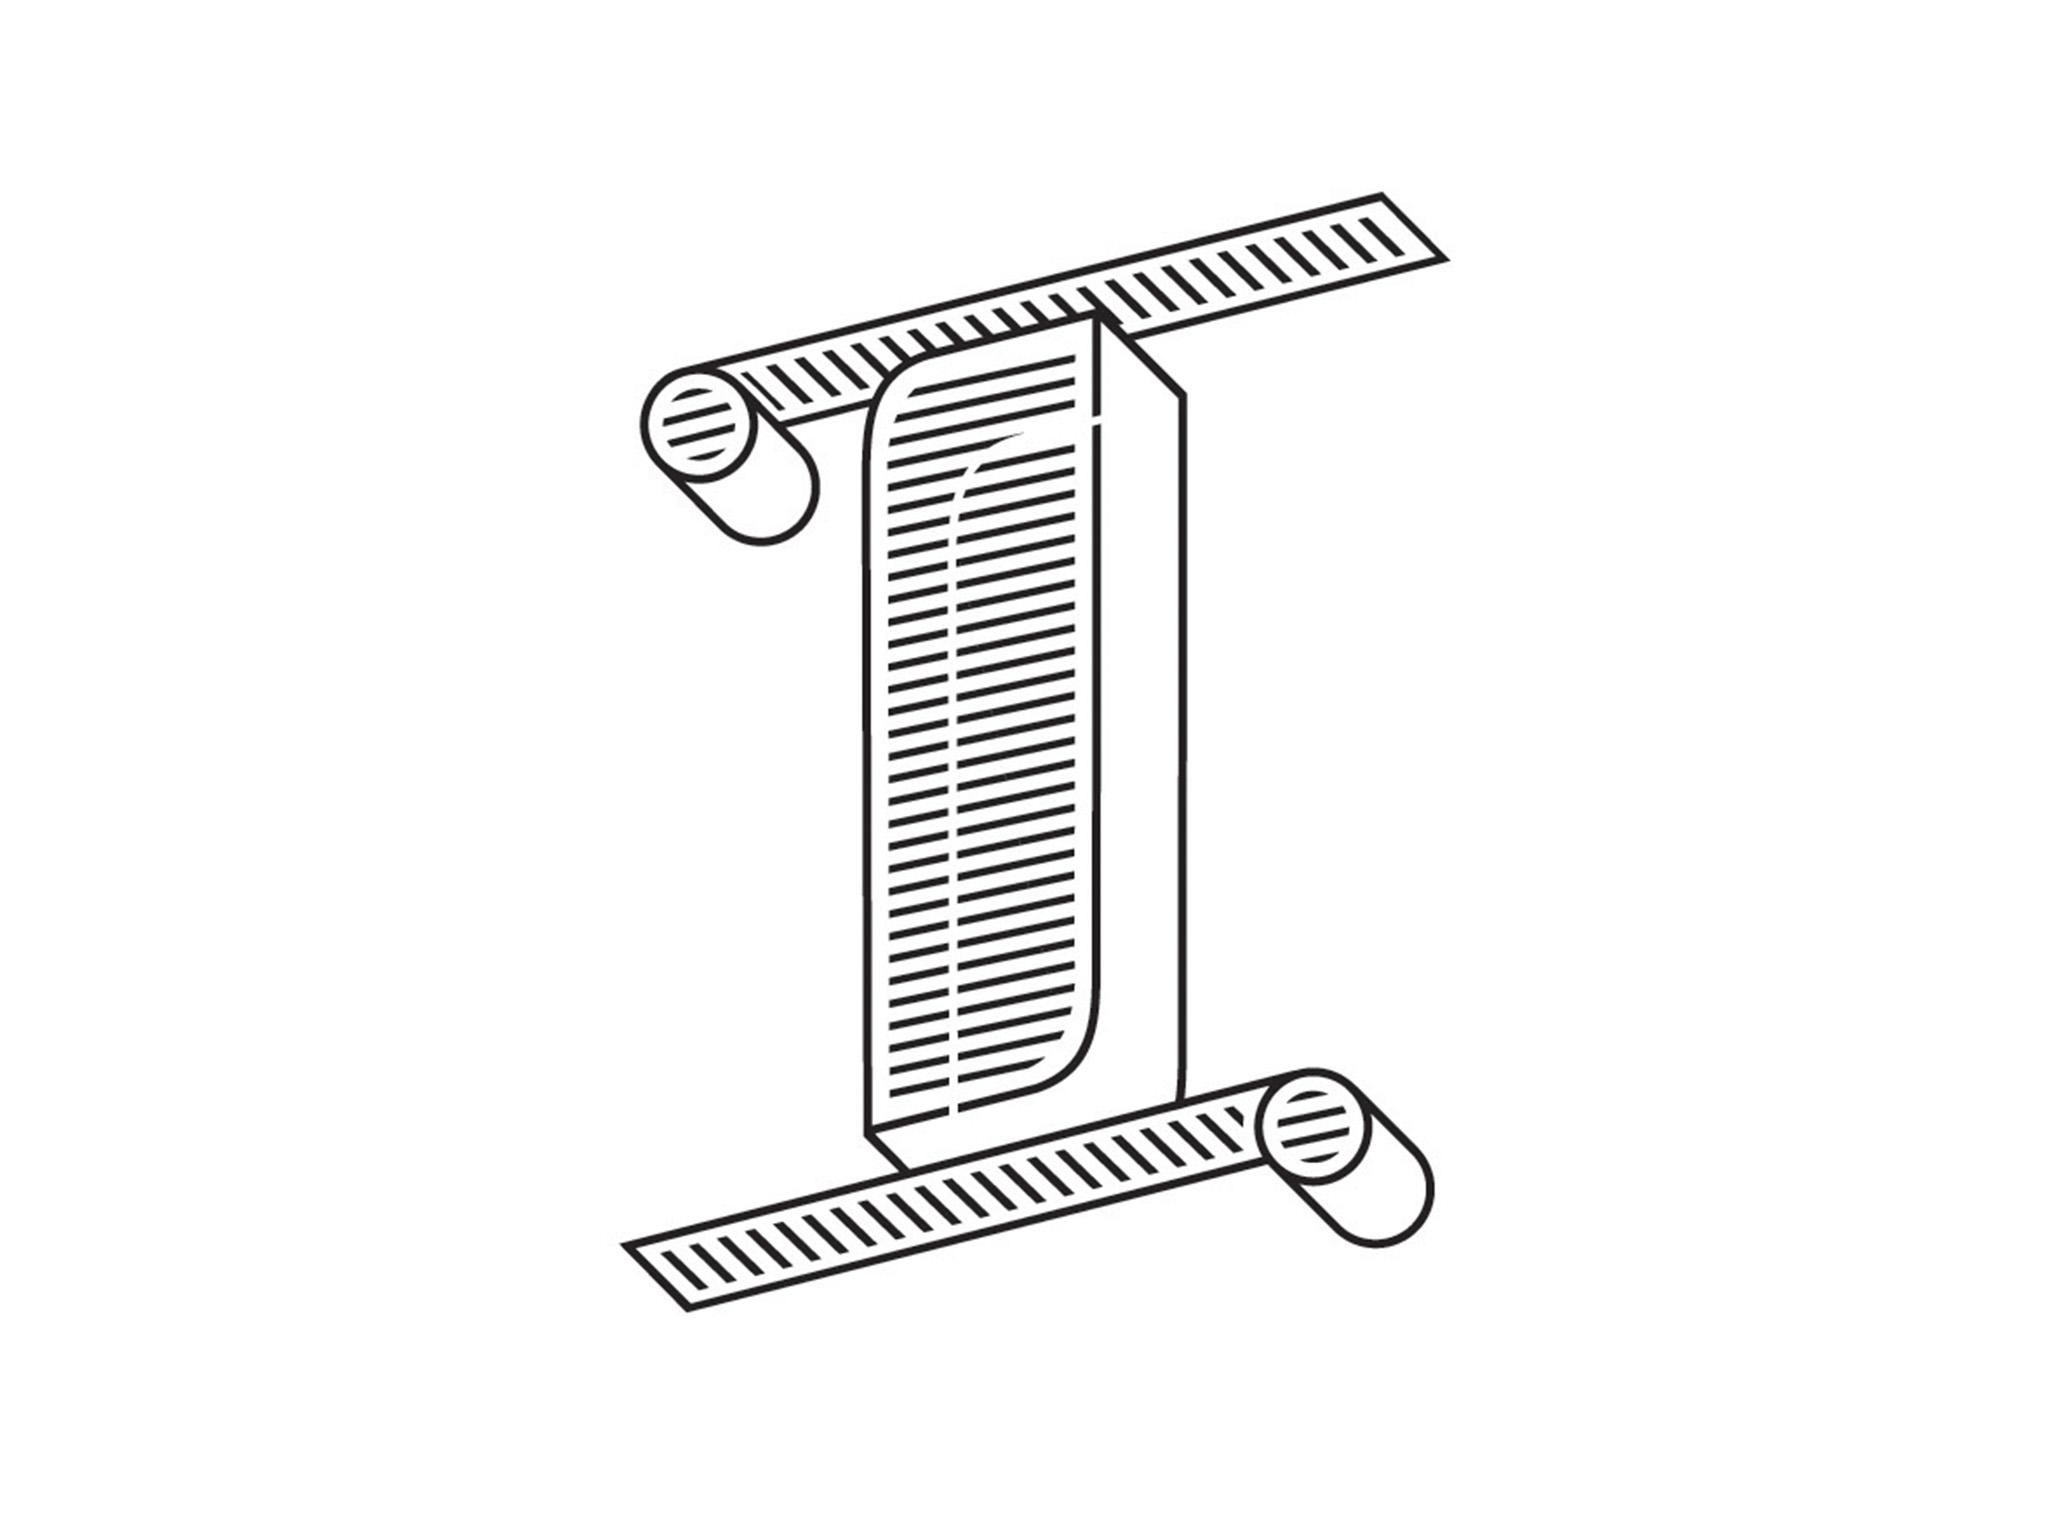 apex_letters_horizontal_large_0013_2_final_alphabet coasters-09.jpg